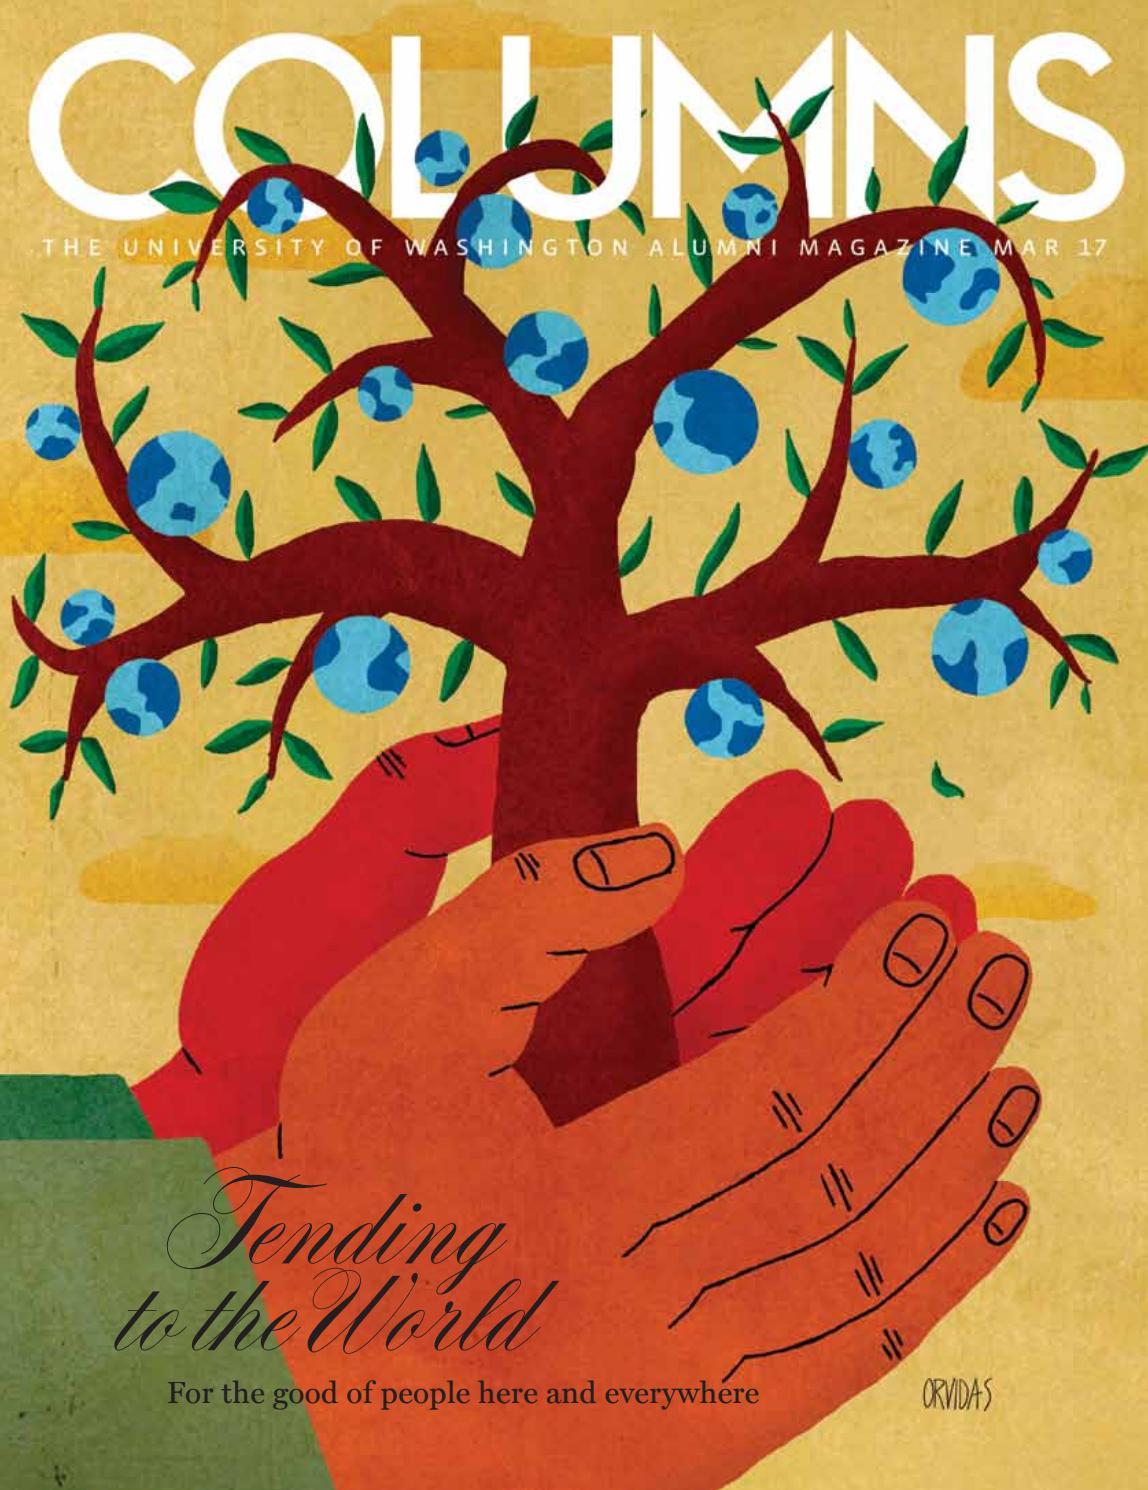 Columns Magazine – March 2017 by University of Washington